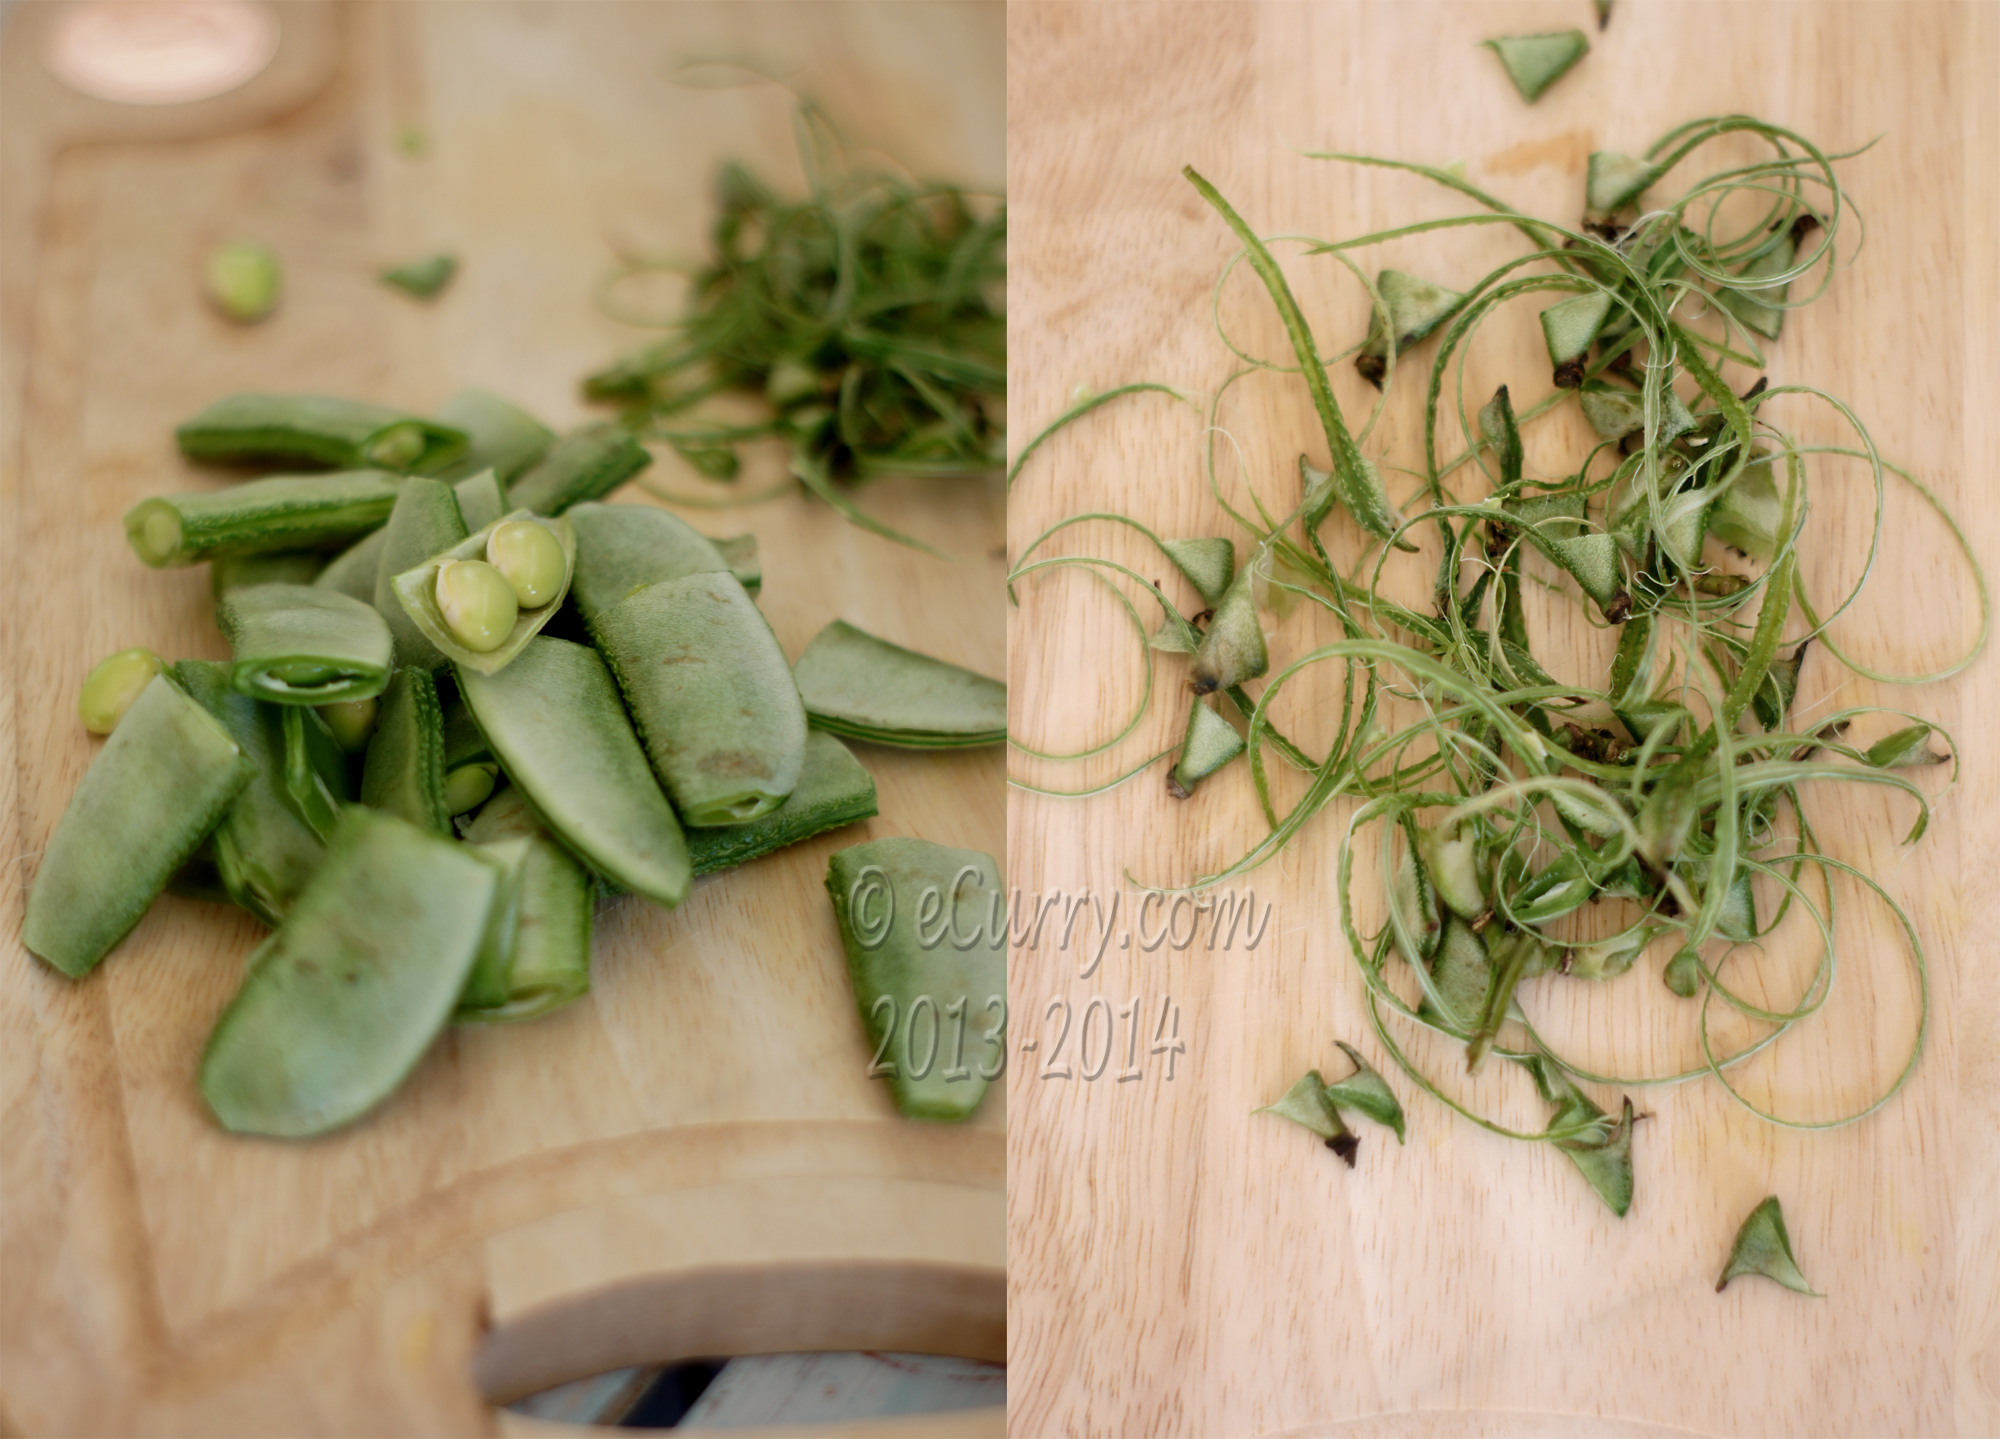 Hyacinth Bean Diptych 1